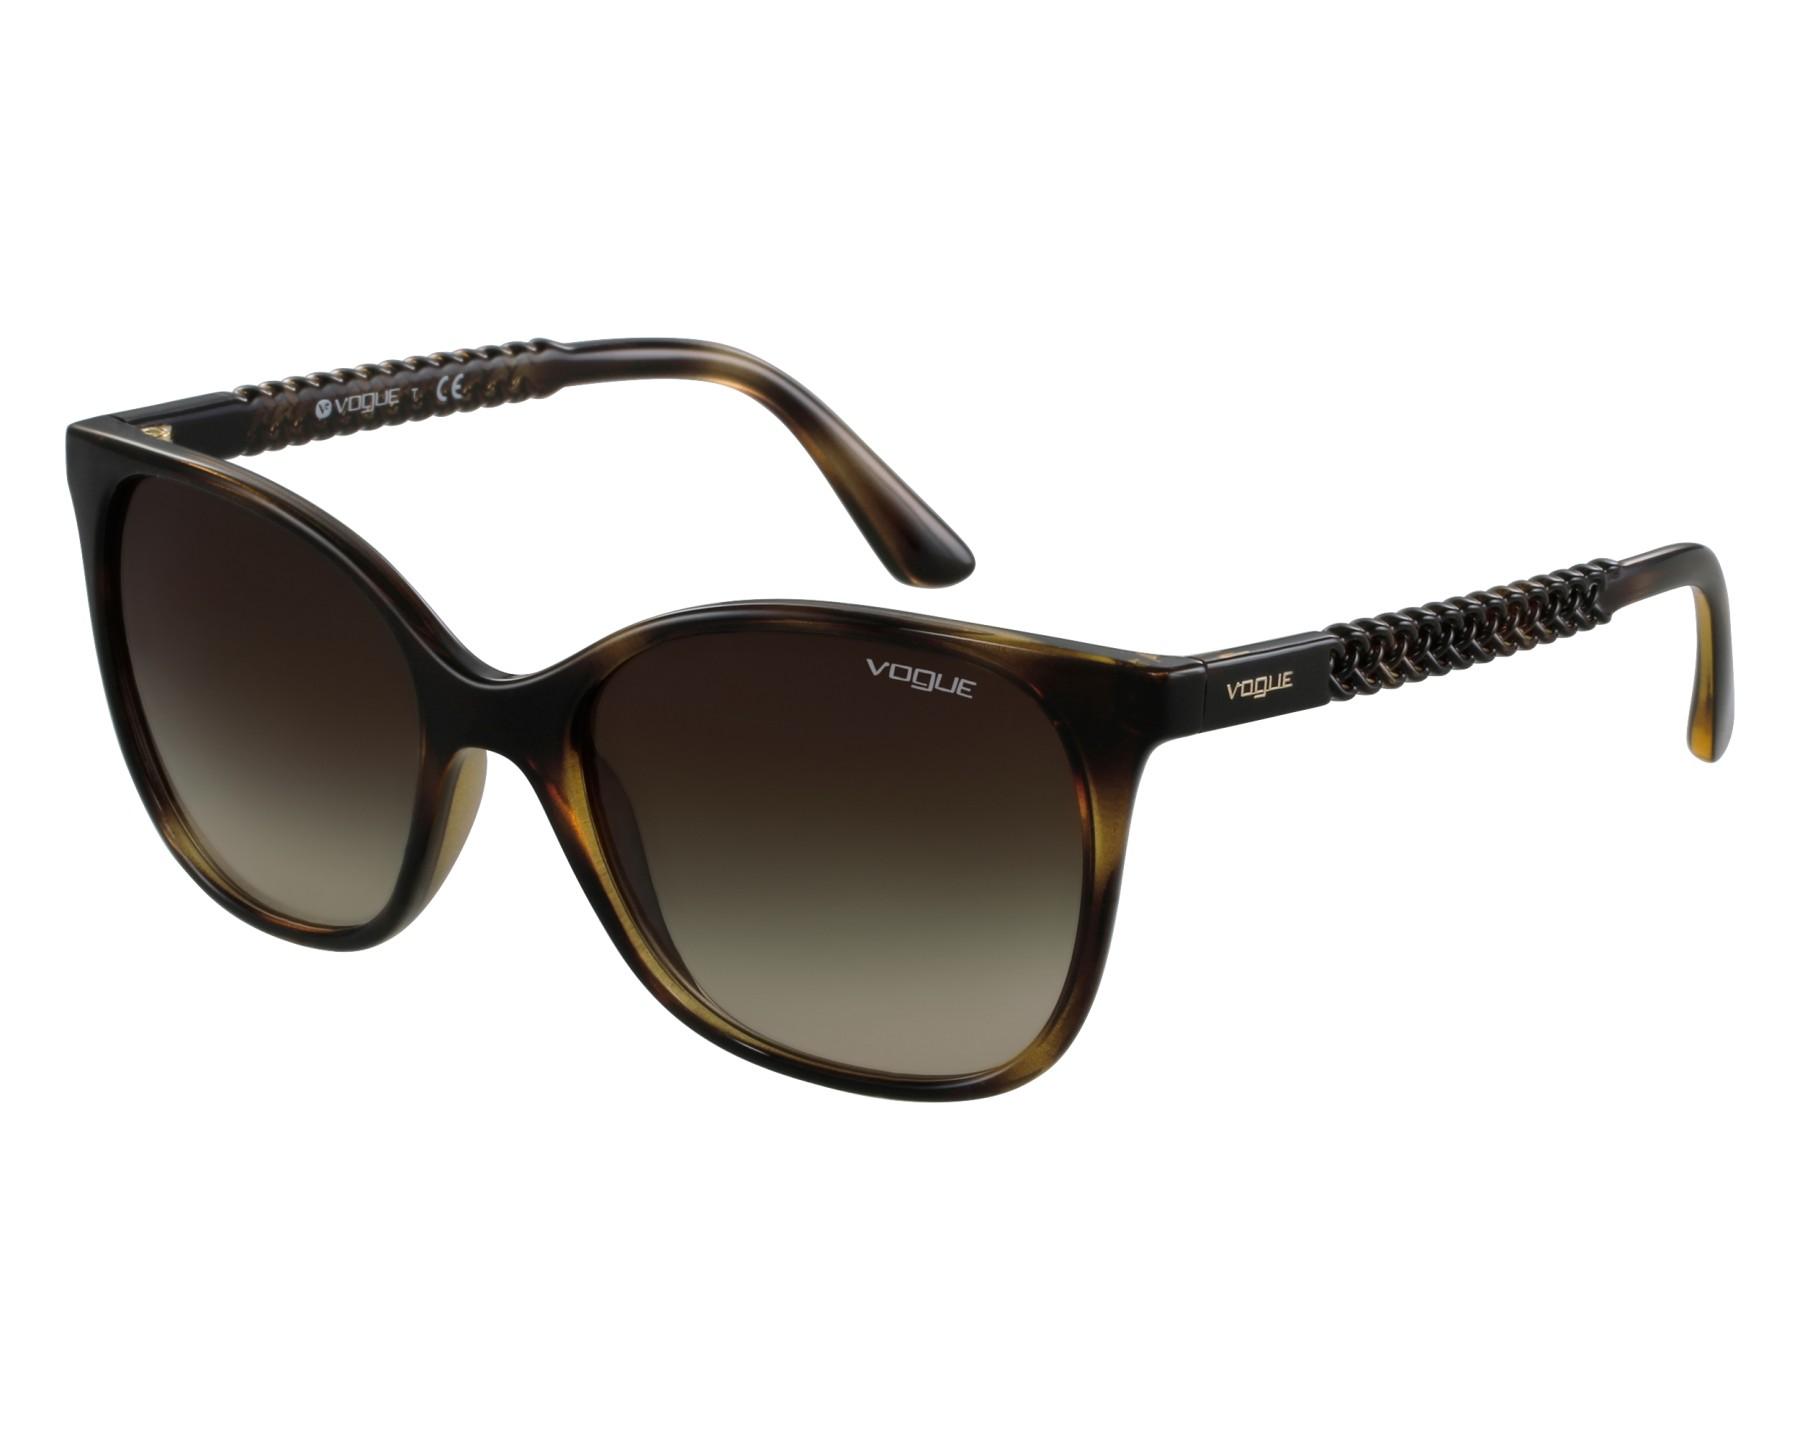 Vogue VO 5032-S W656/13 Sonnenbrille bHBc4WpygY